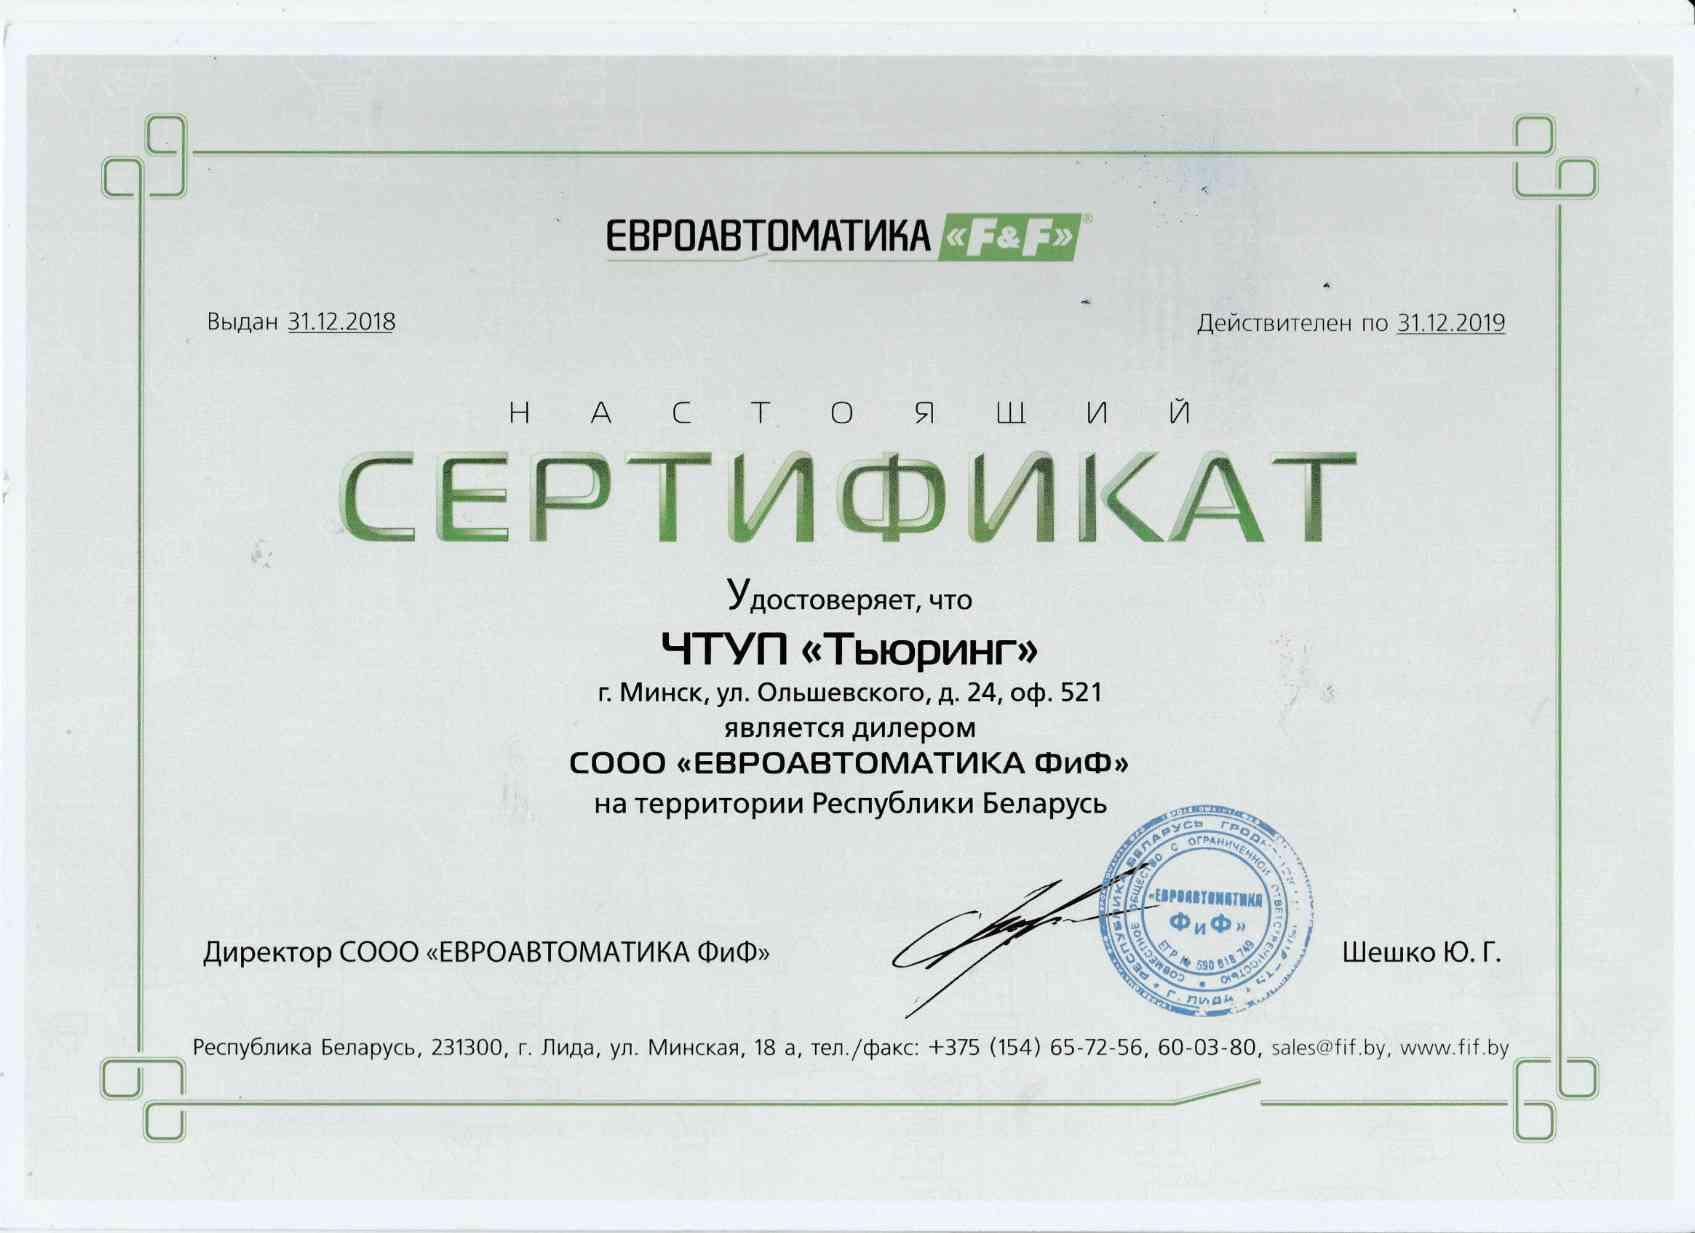 Сертификат дилера Евроавтоматика ФиФ Тьюринг